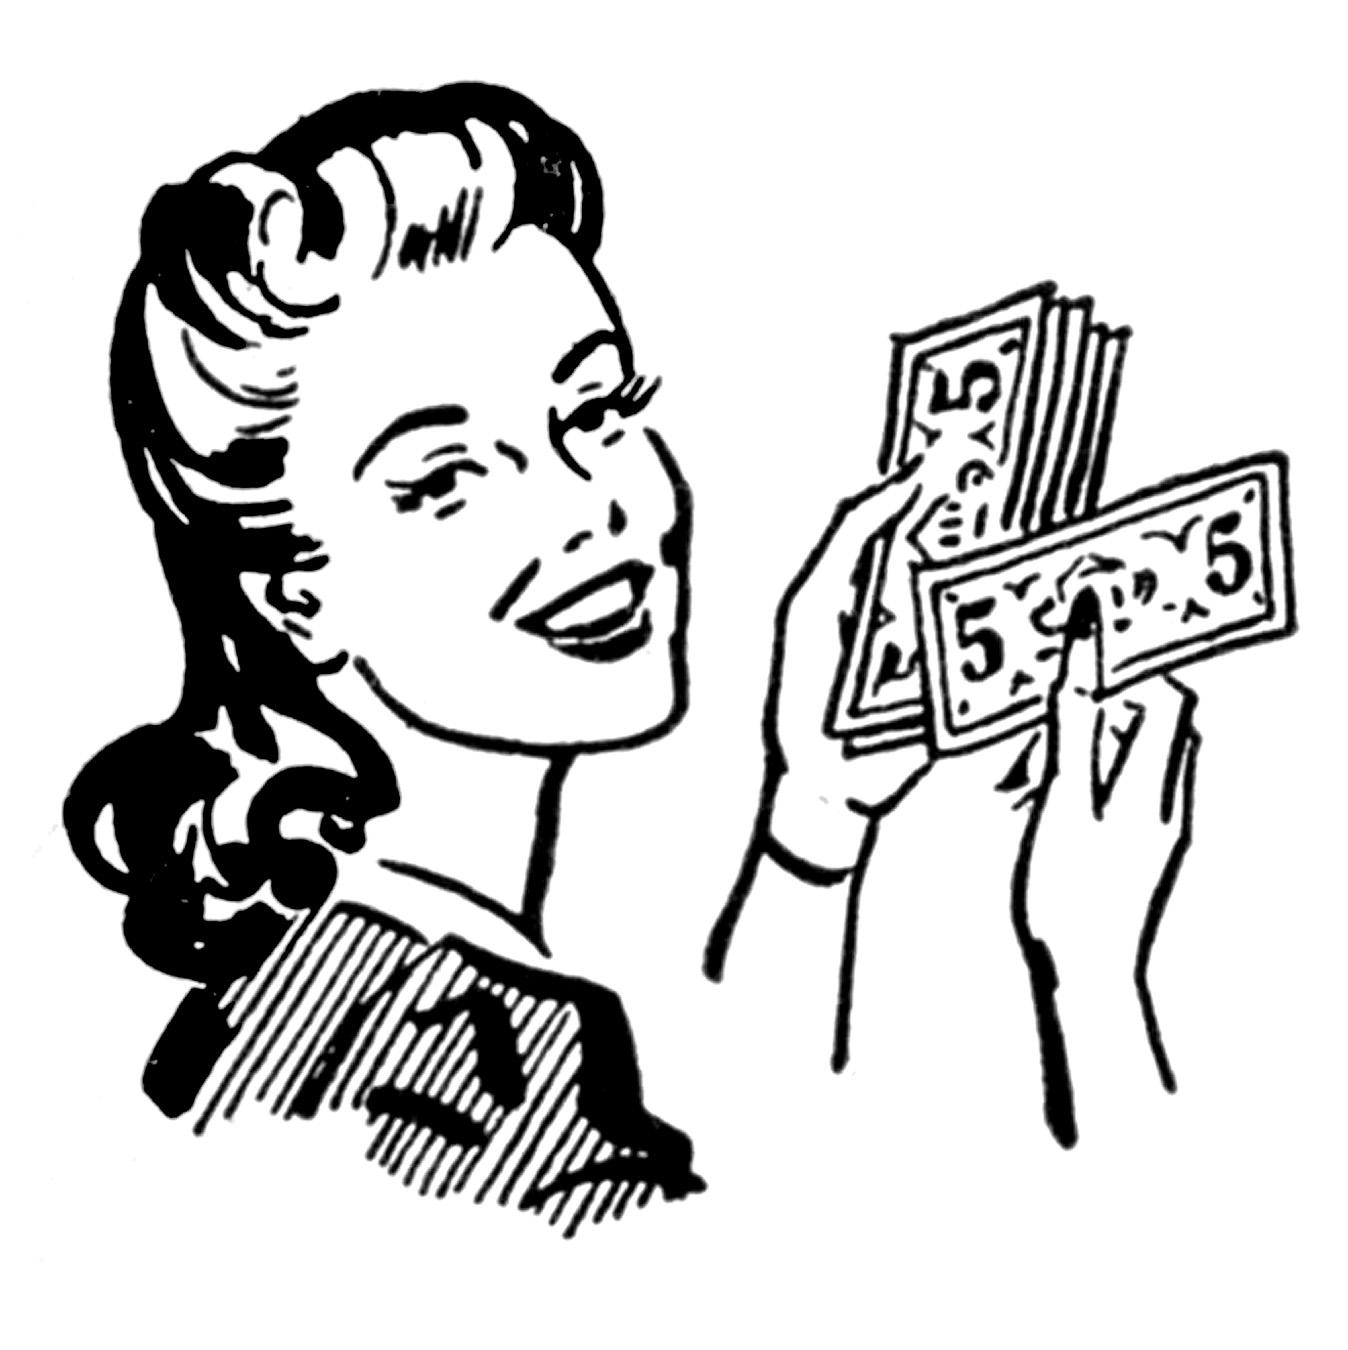 Coupon retro clip art money moms women the graphics fairy